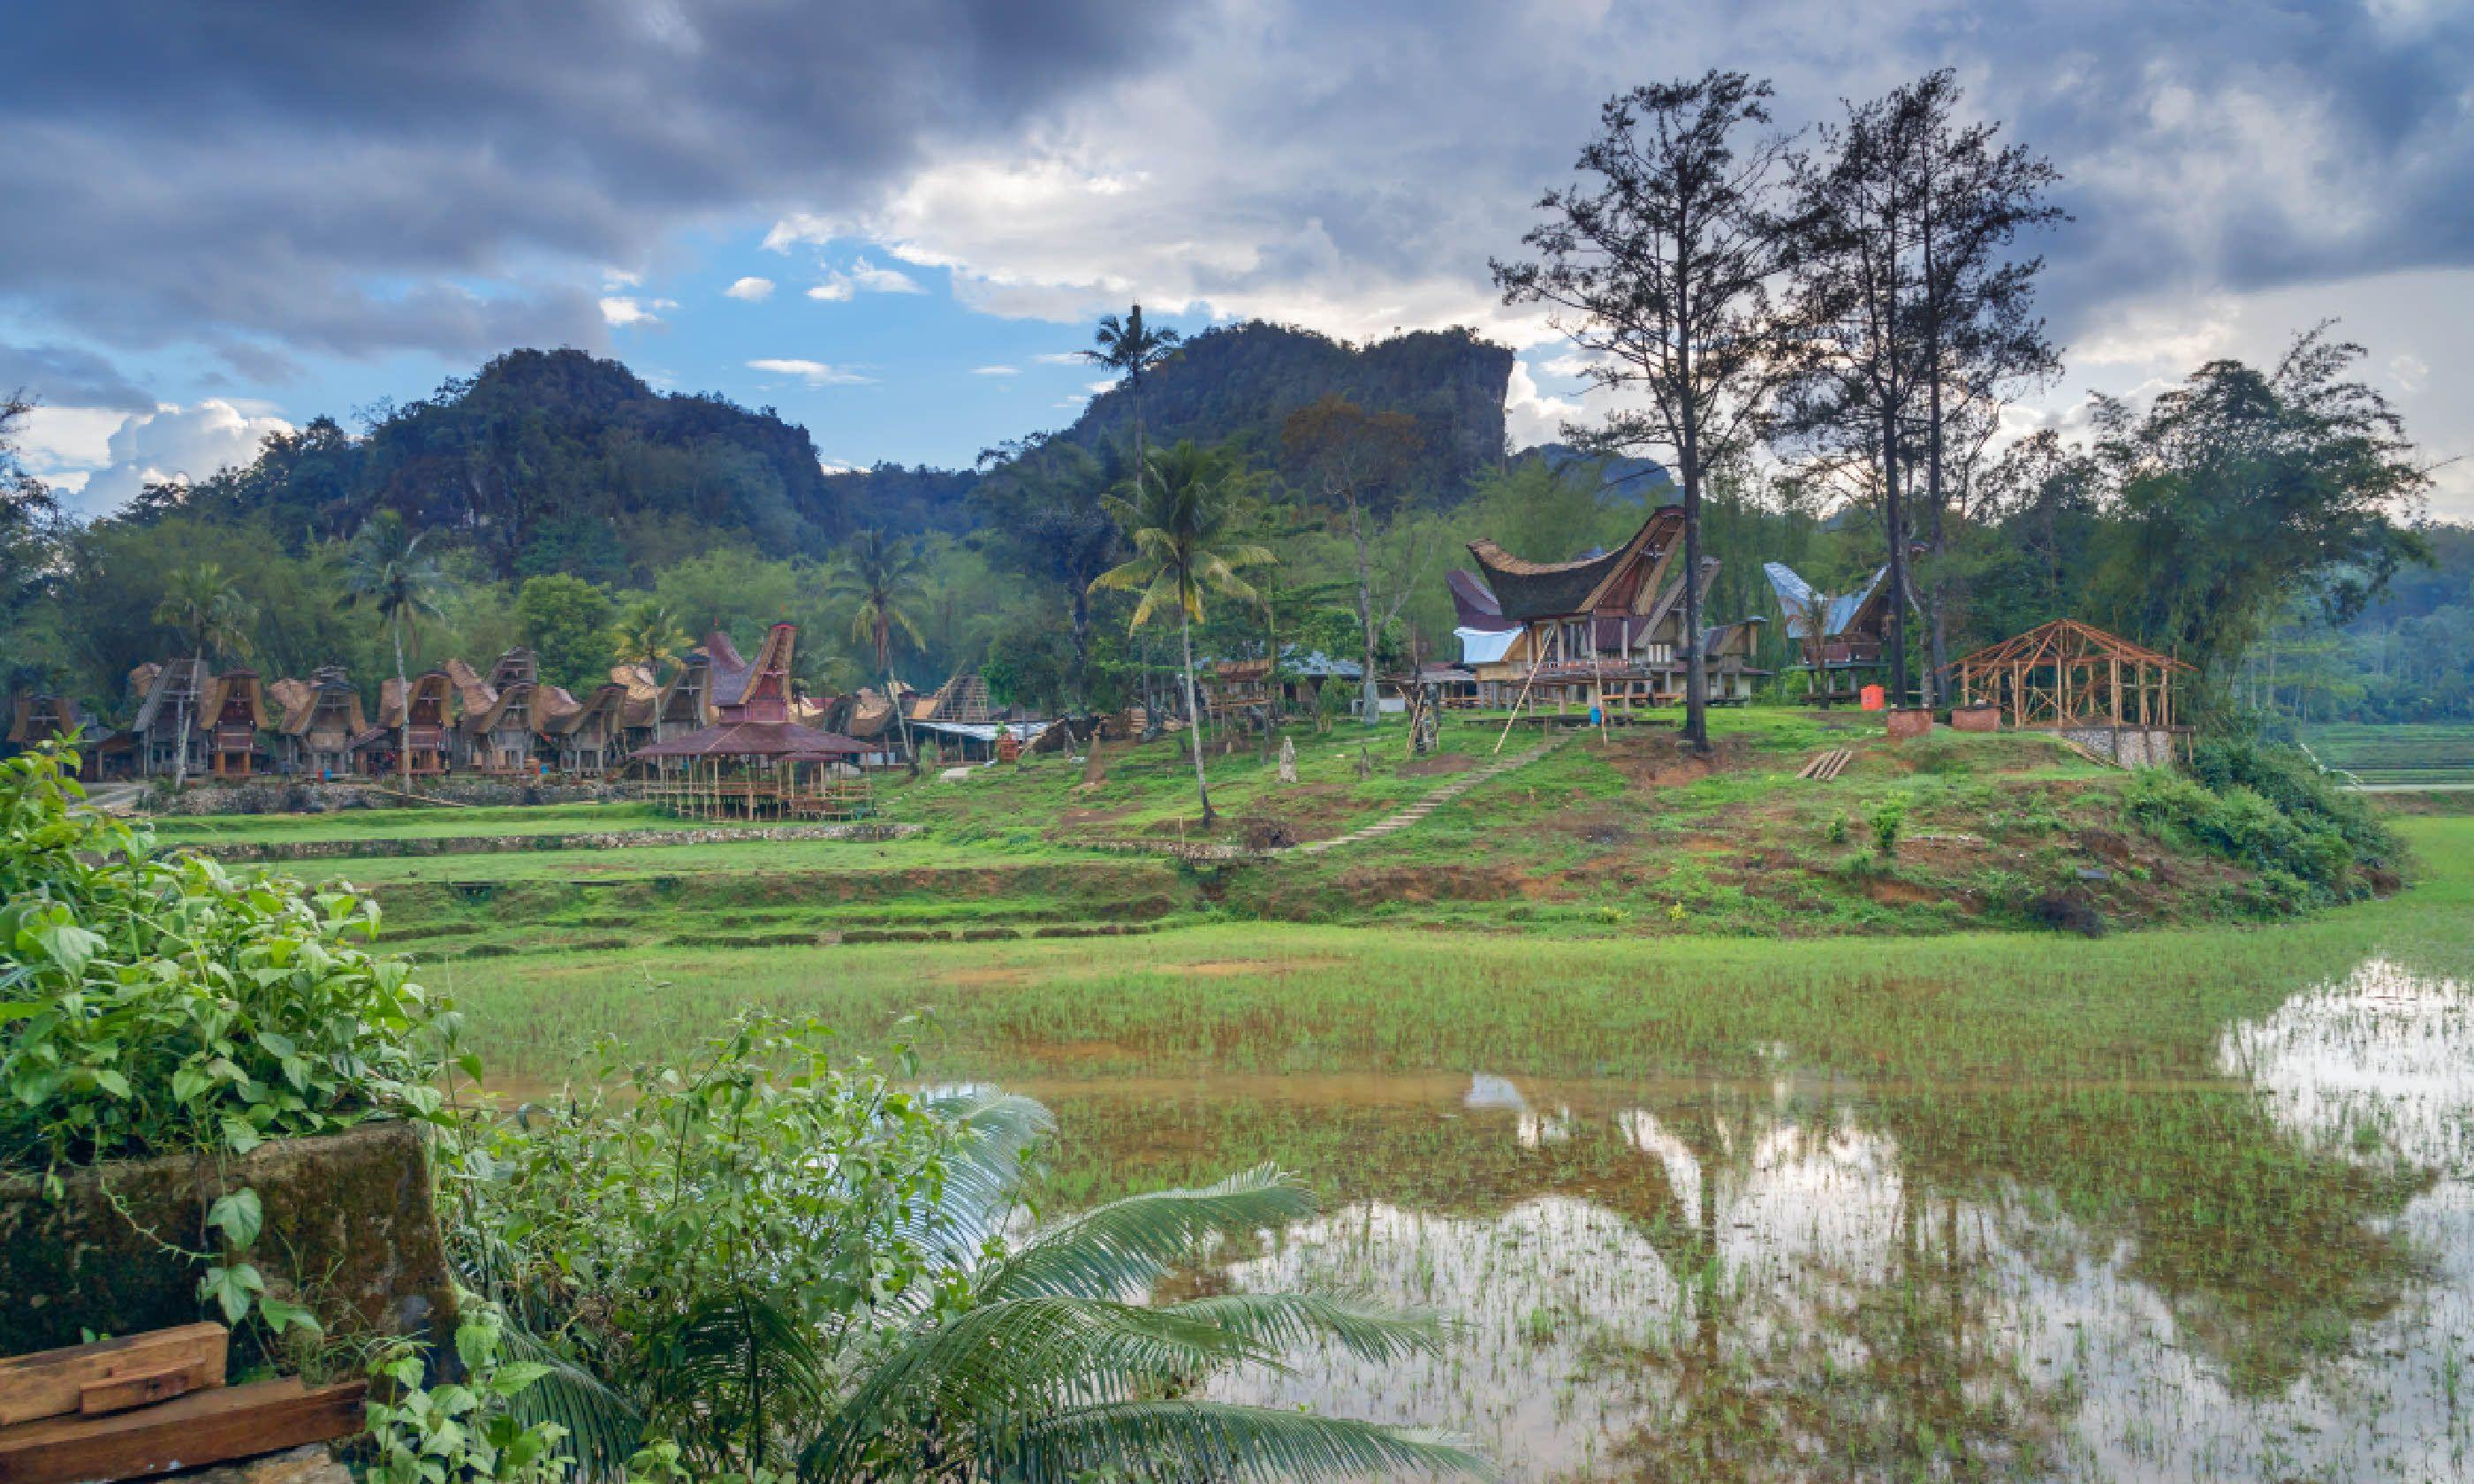 Tongkonan traditional village Kete Kesu (Shutterstock)